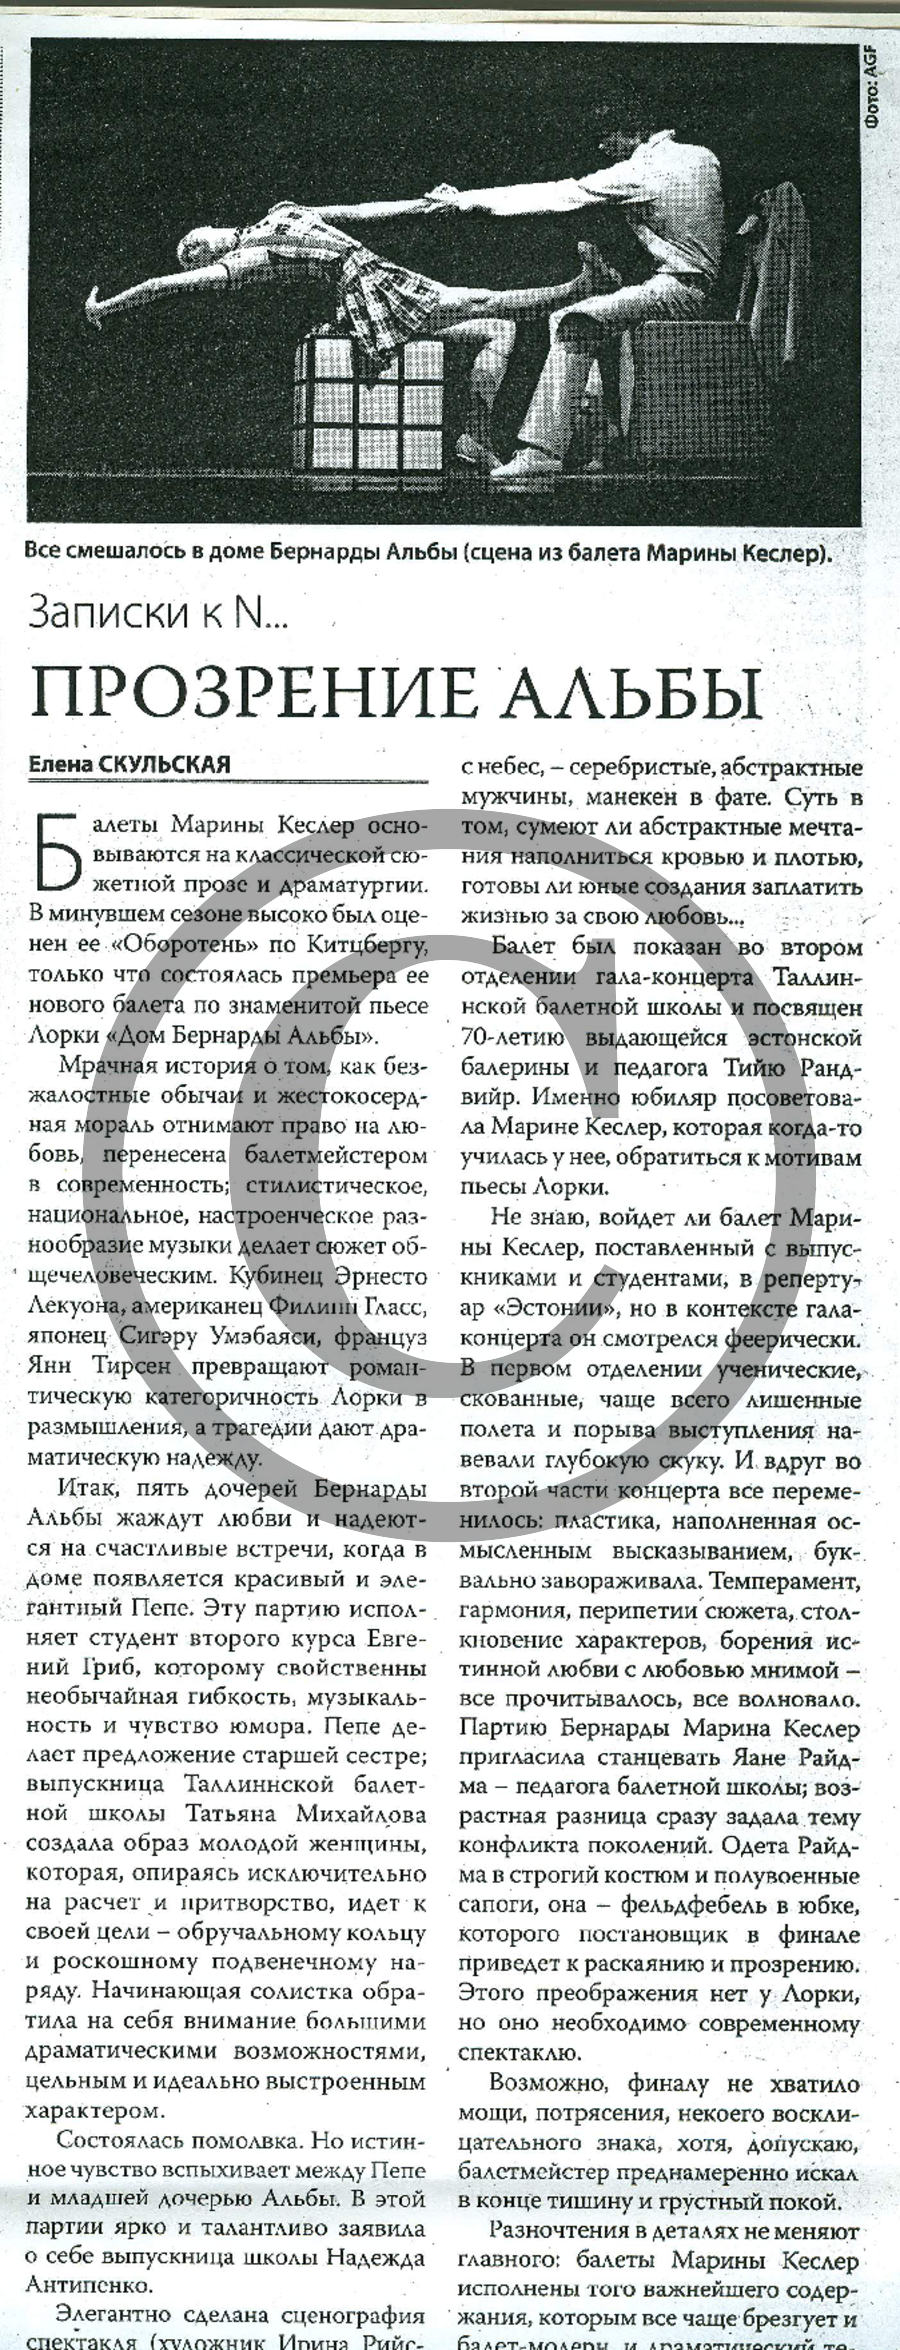 DzaD_Skulskaja